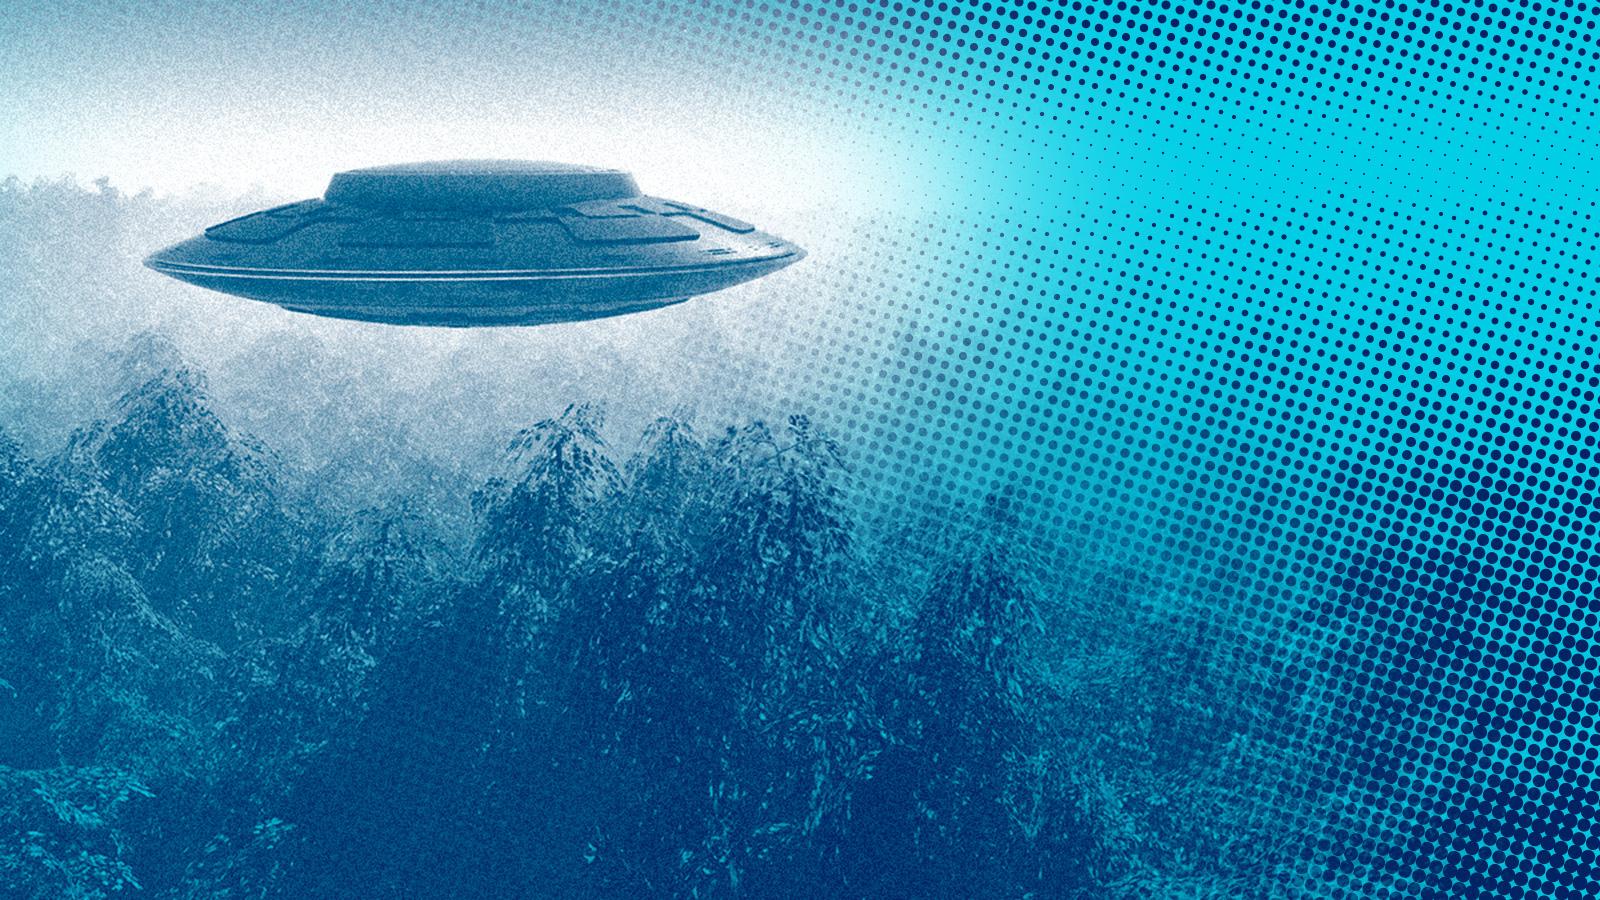 Waarom die vreemde geheimzinnigheid rond UFO's en buitenaardsen?